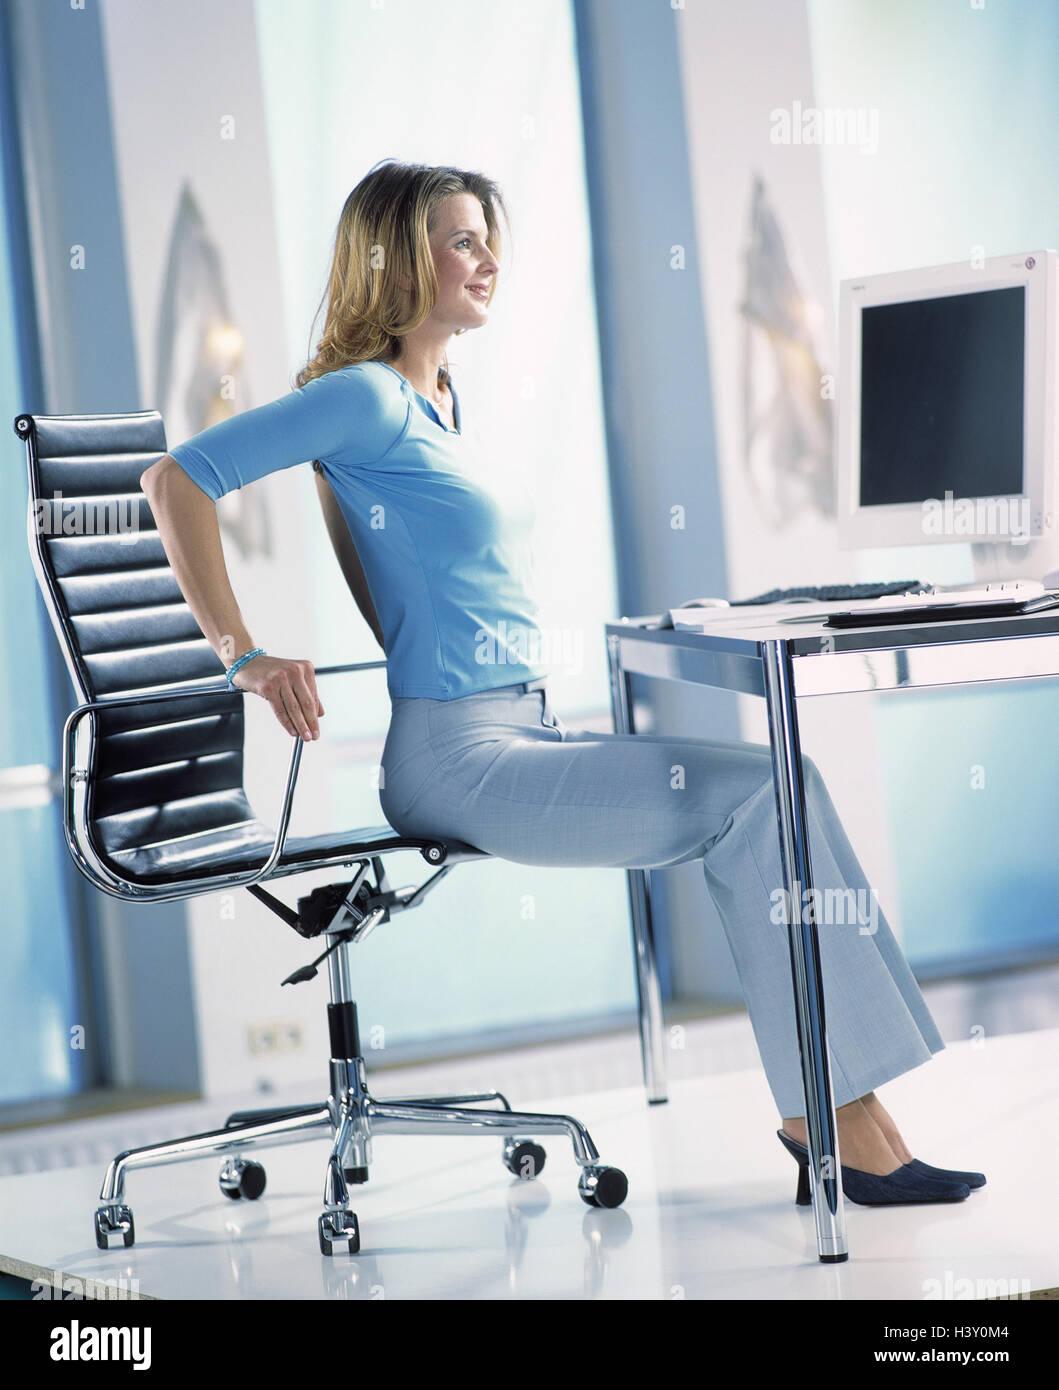 office relaxation. Workplace, Clerks, Gymnastics, Woman, Office Workers, Relaxation Exercises, Relaxation, Musculature, Position, Dehnübungen, Ergonomics, Change, G